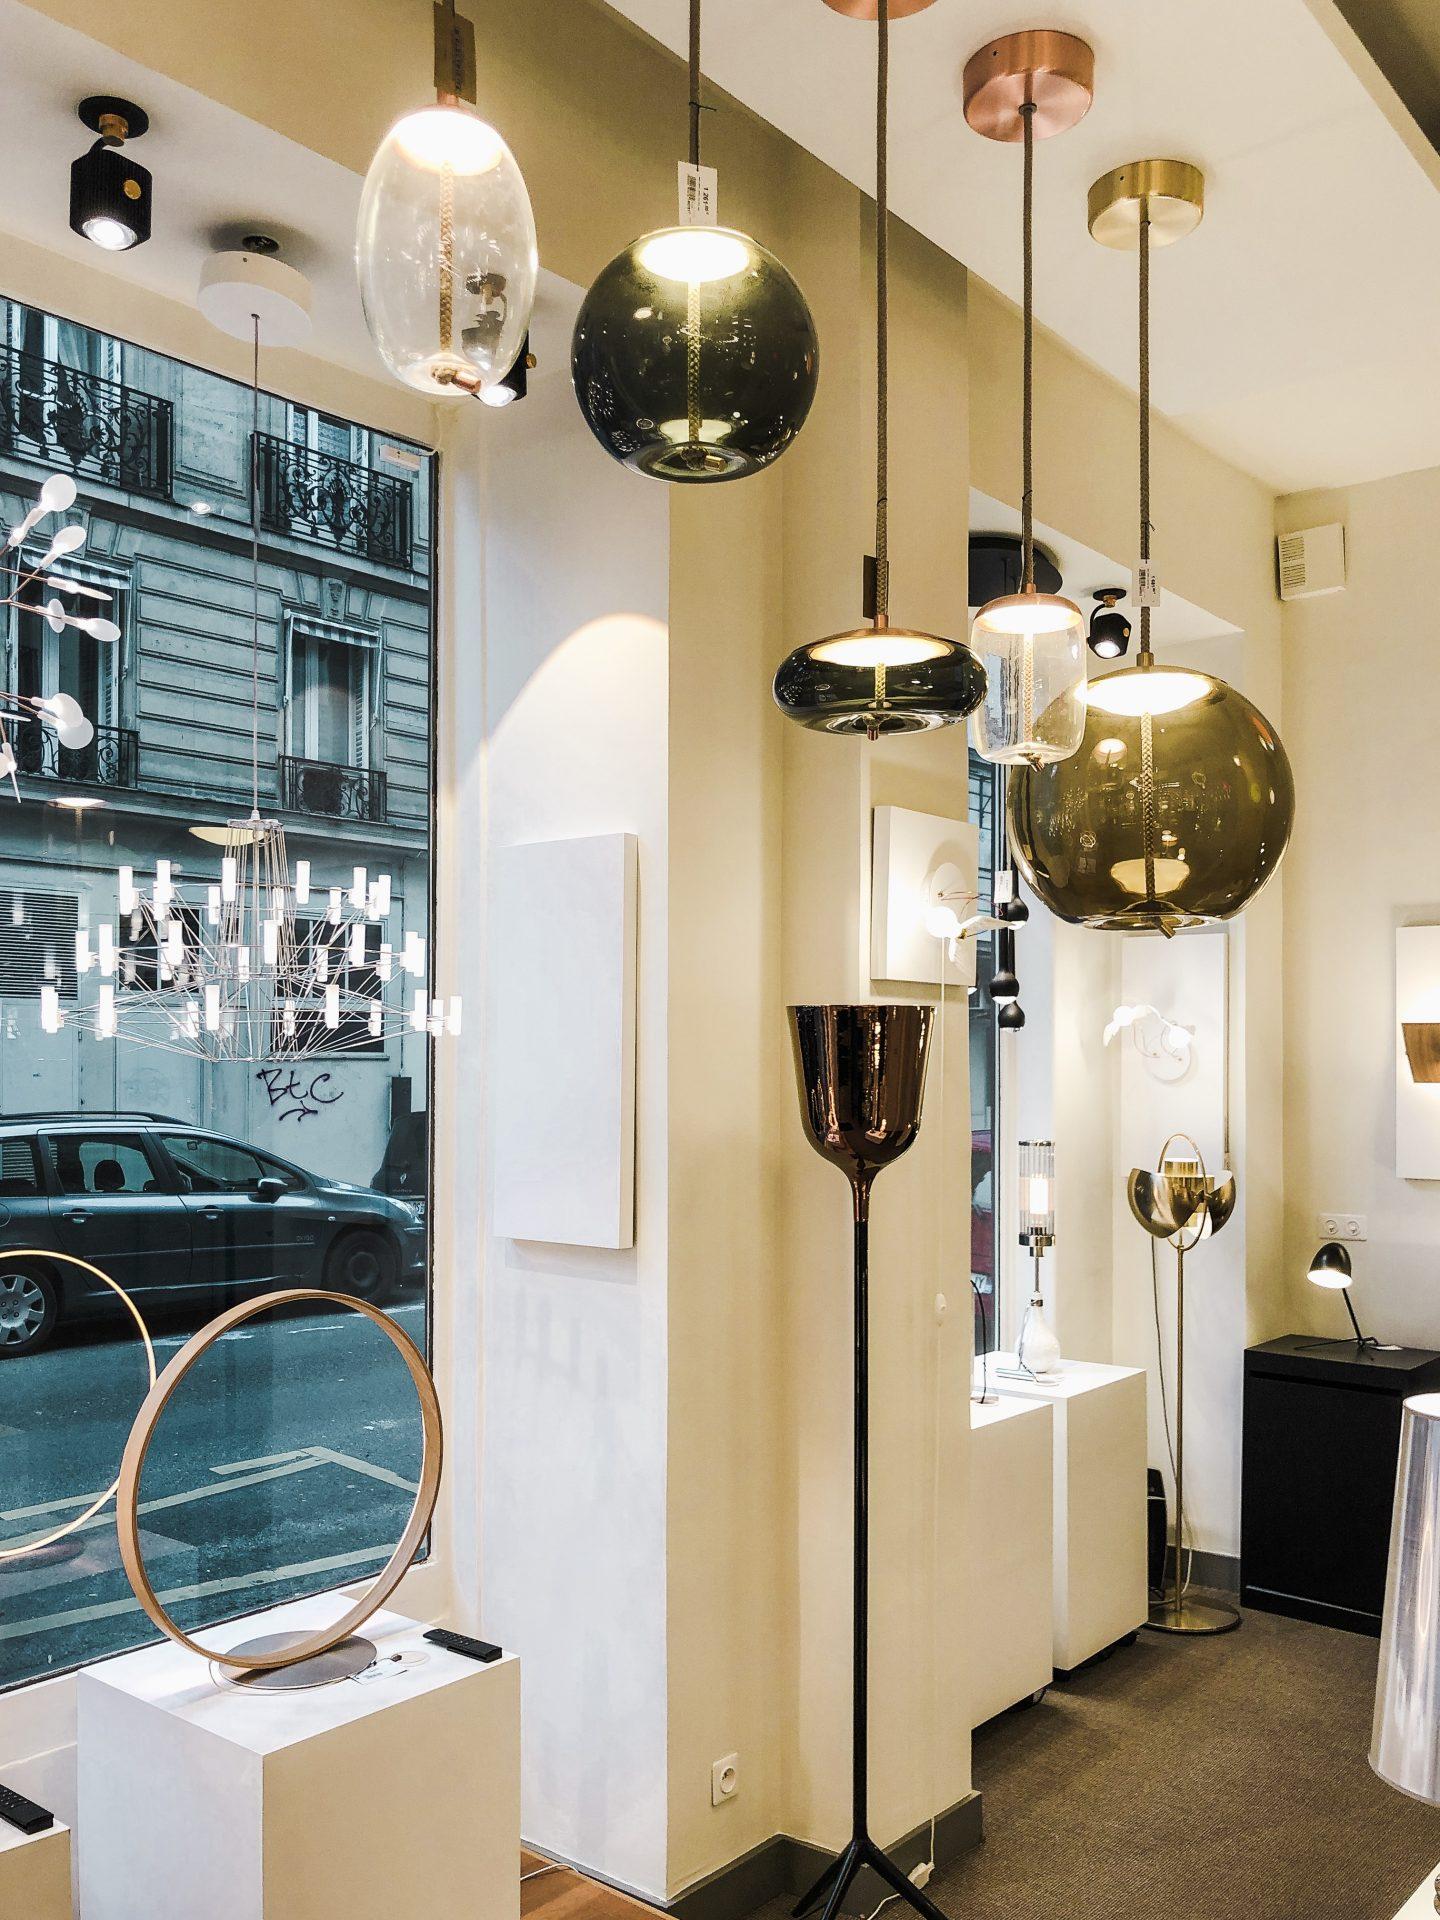 bazar electricite paris bastille 2 decouvrirdesign. Black Bedroom Furniture Sets. Home Design Ideas